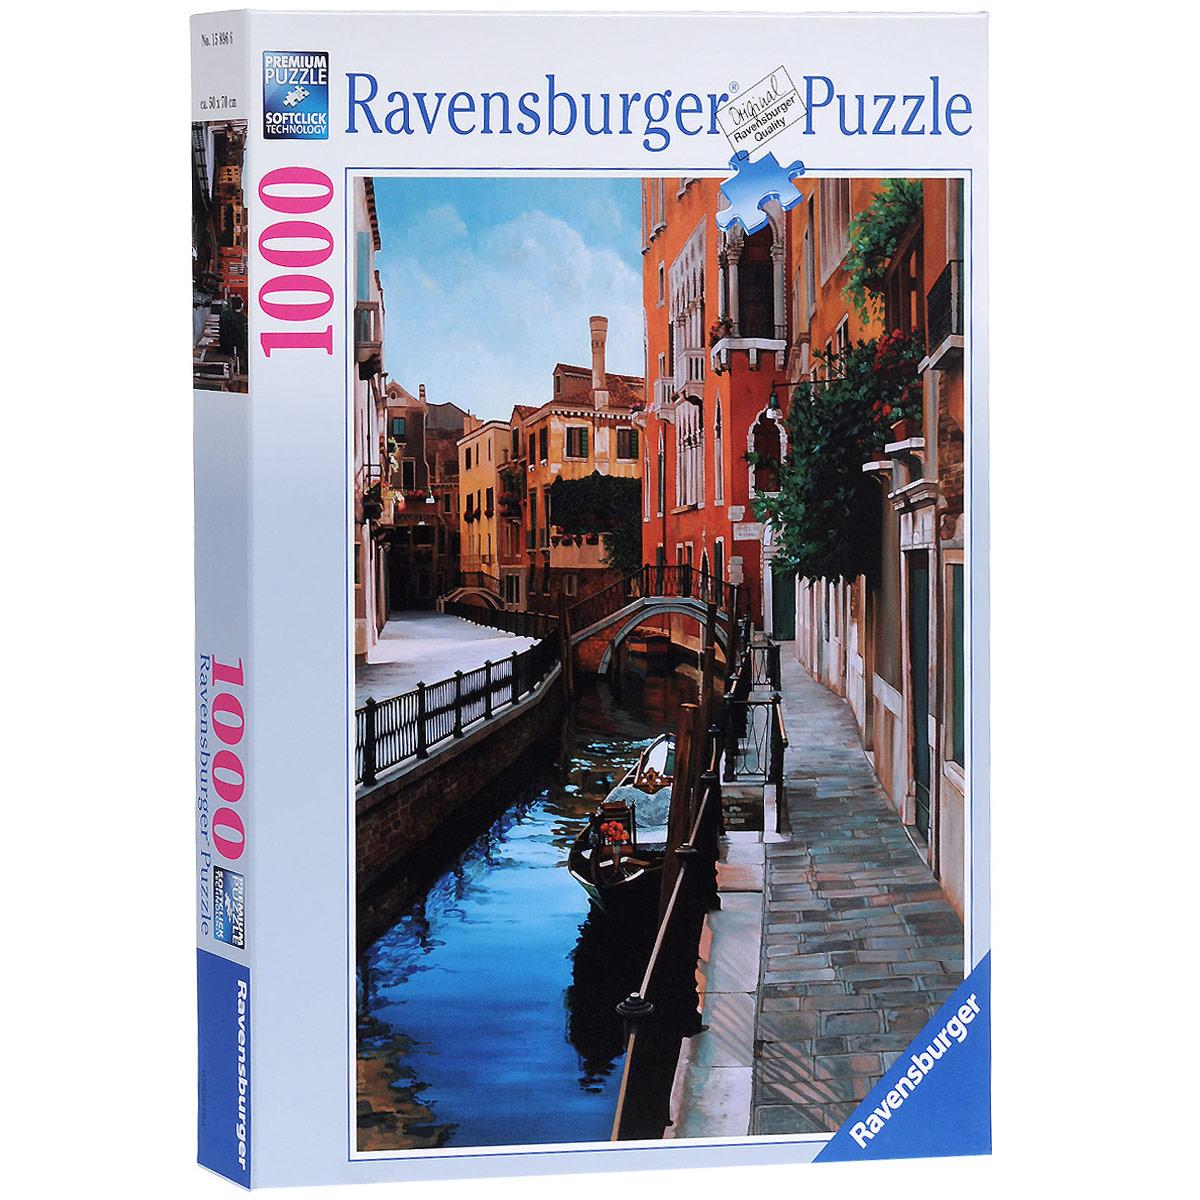 Ravensburger Венеция. Пазл, 1000 элементов